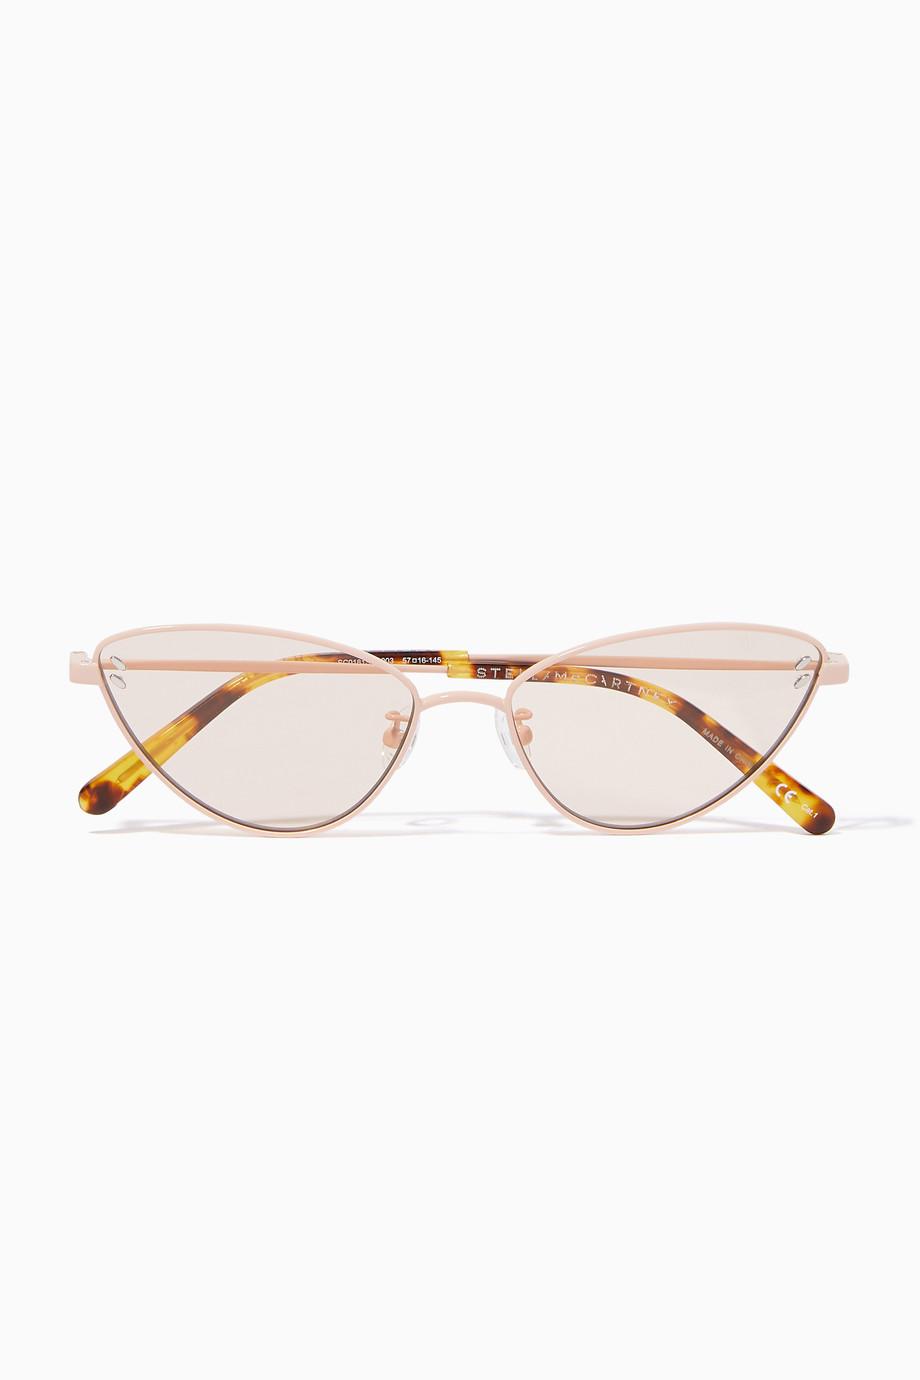 2c89252bb0 Shop Stella McCartney Pink Cat-Eye Metal Frame Sunglasses for Women ...